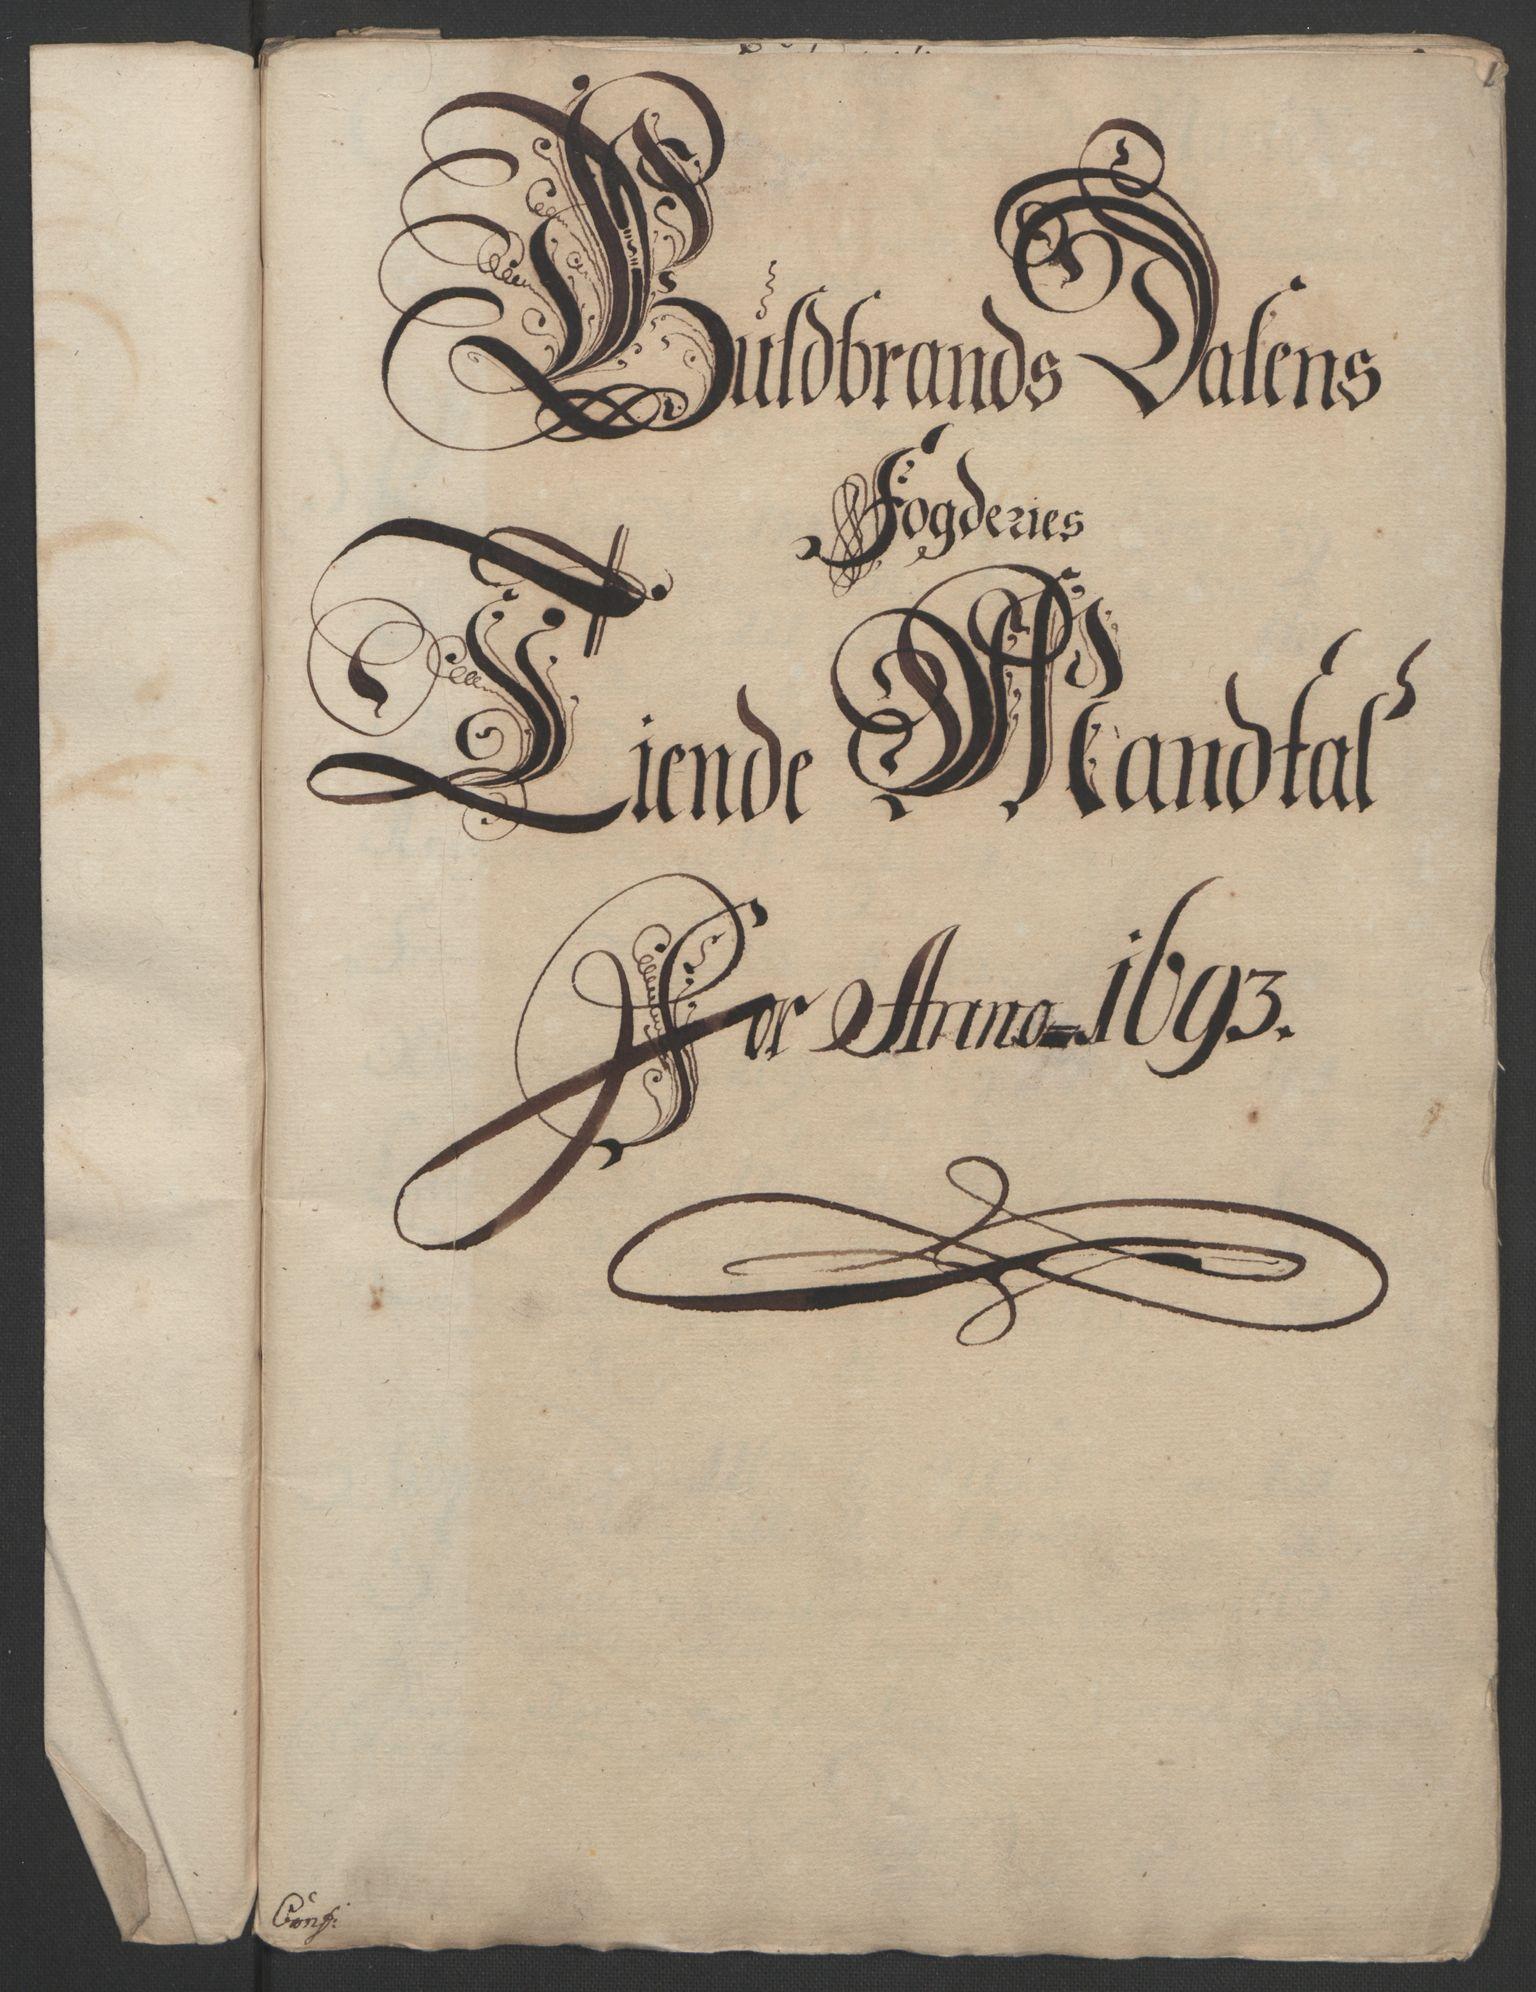 RA, Rentekammeret inntil 1814, Reviderte regnskaper, Fogderegnskap, R17/L1167: Fogderegnskap Gudbrandsdal, 1693, s. 229